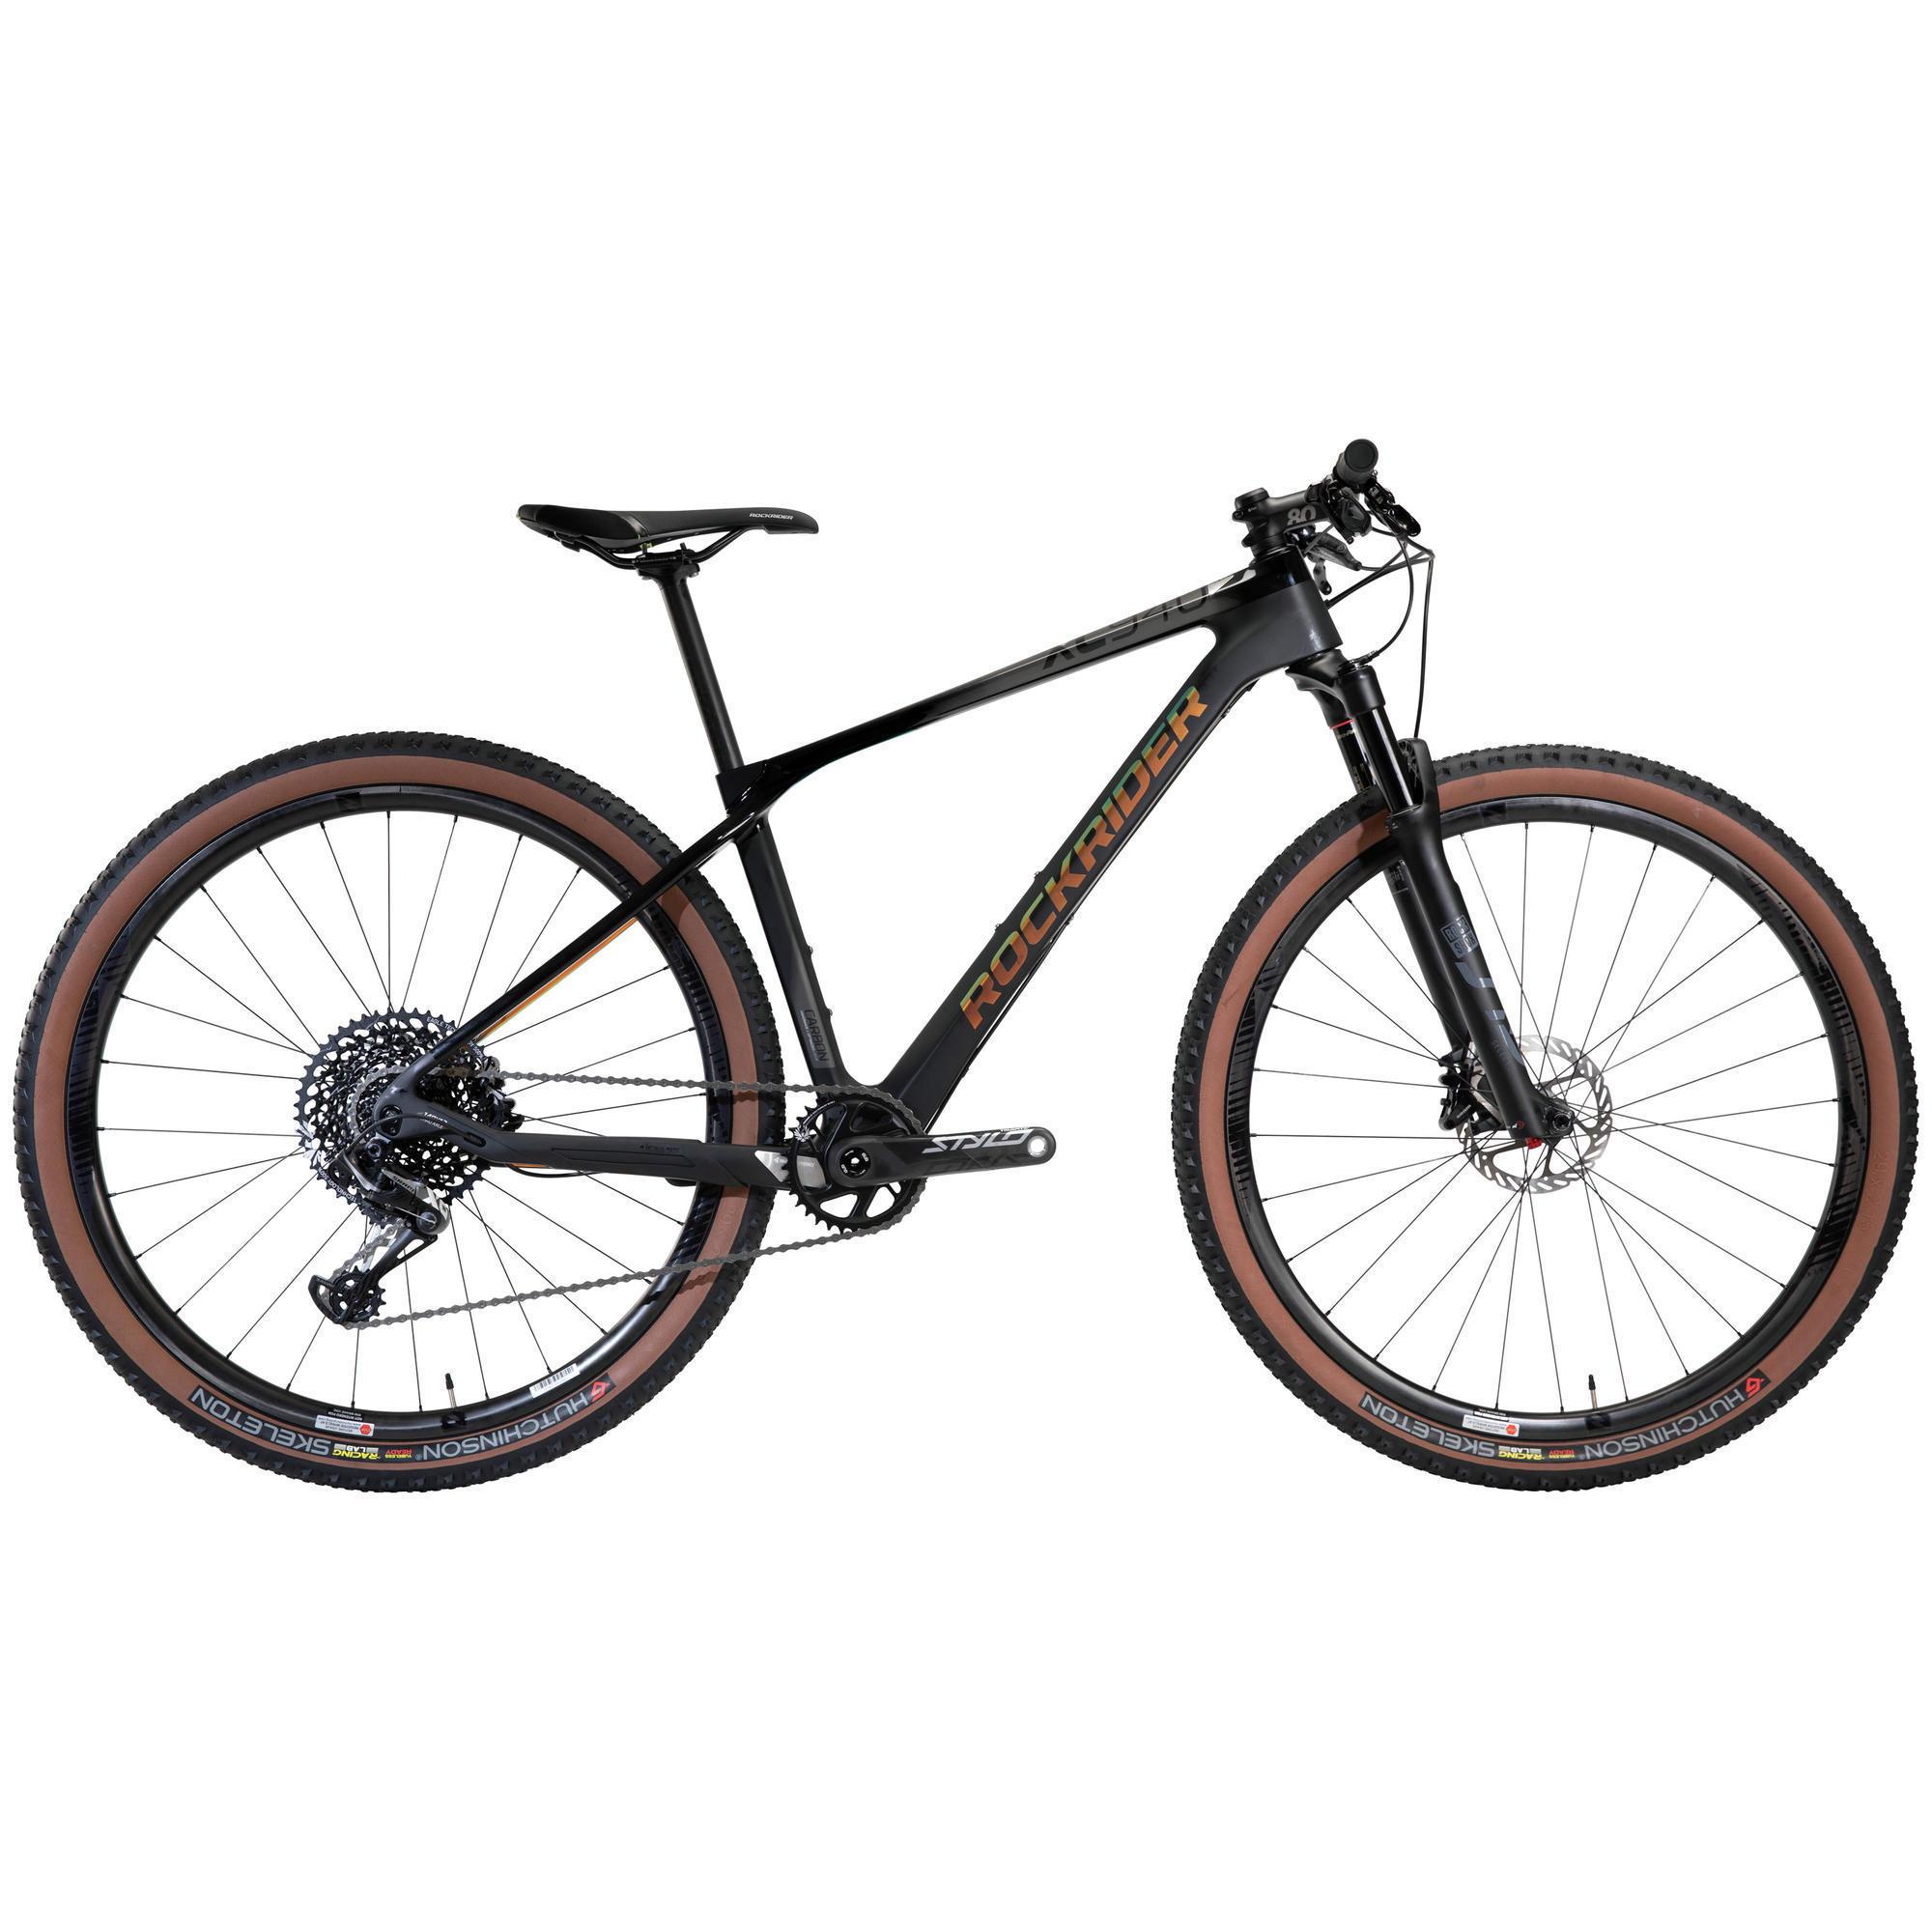 Rockrider Vélo VTT XC 940 LTD 29 semi rigide CARBONE Eagle 1x12 noir - Rockrider